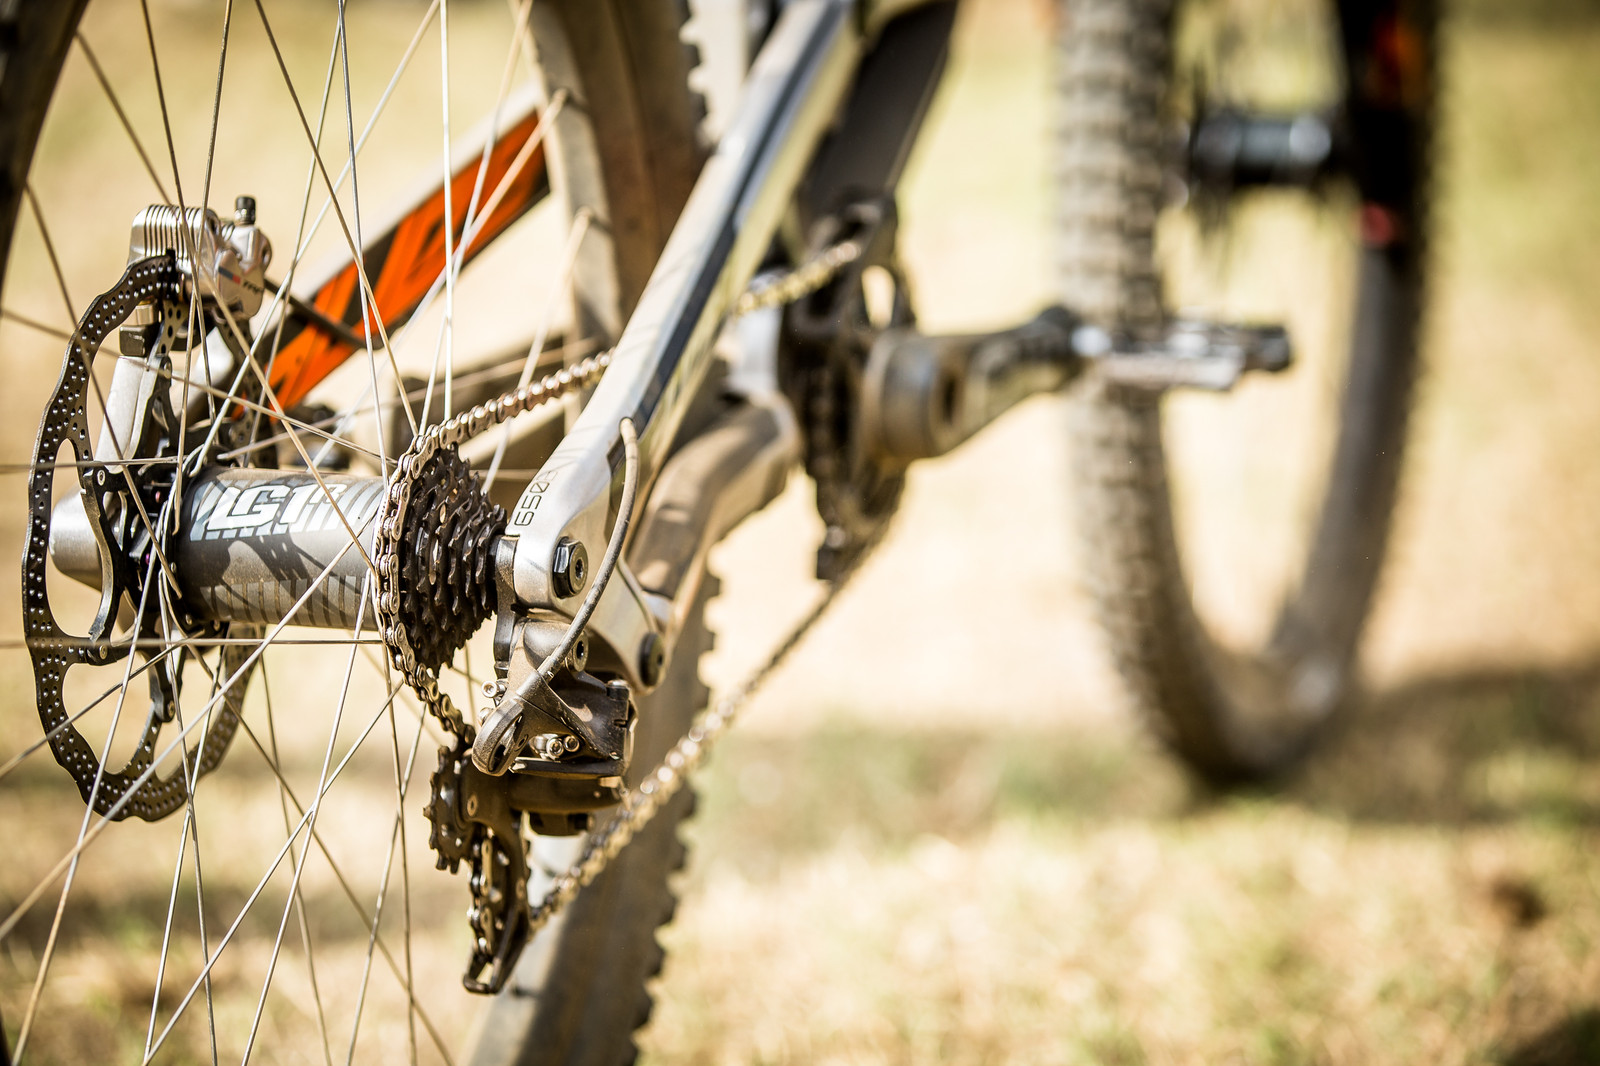 e*thirteen LG1 DH 7 speed cassette - WINNING BIKE: Aaron Gwin's YT TUES - Mountain Biking Pictures - Vital MTB